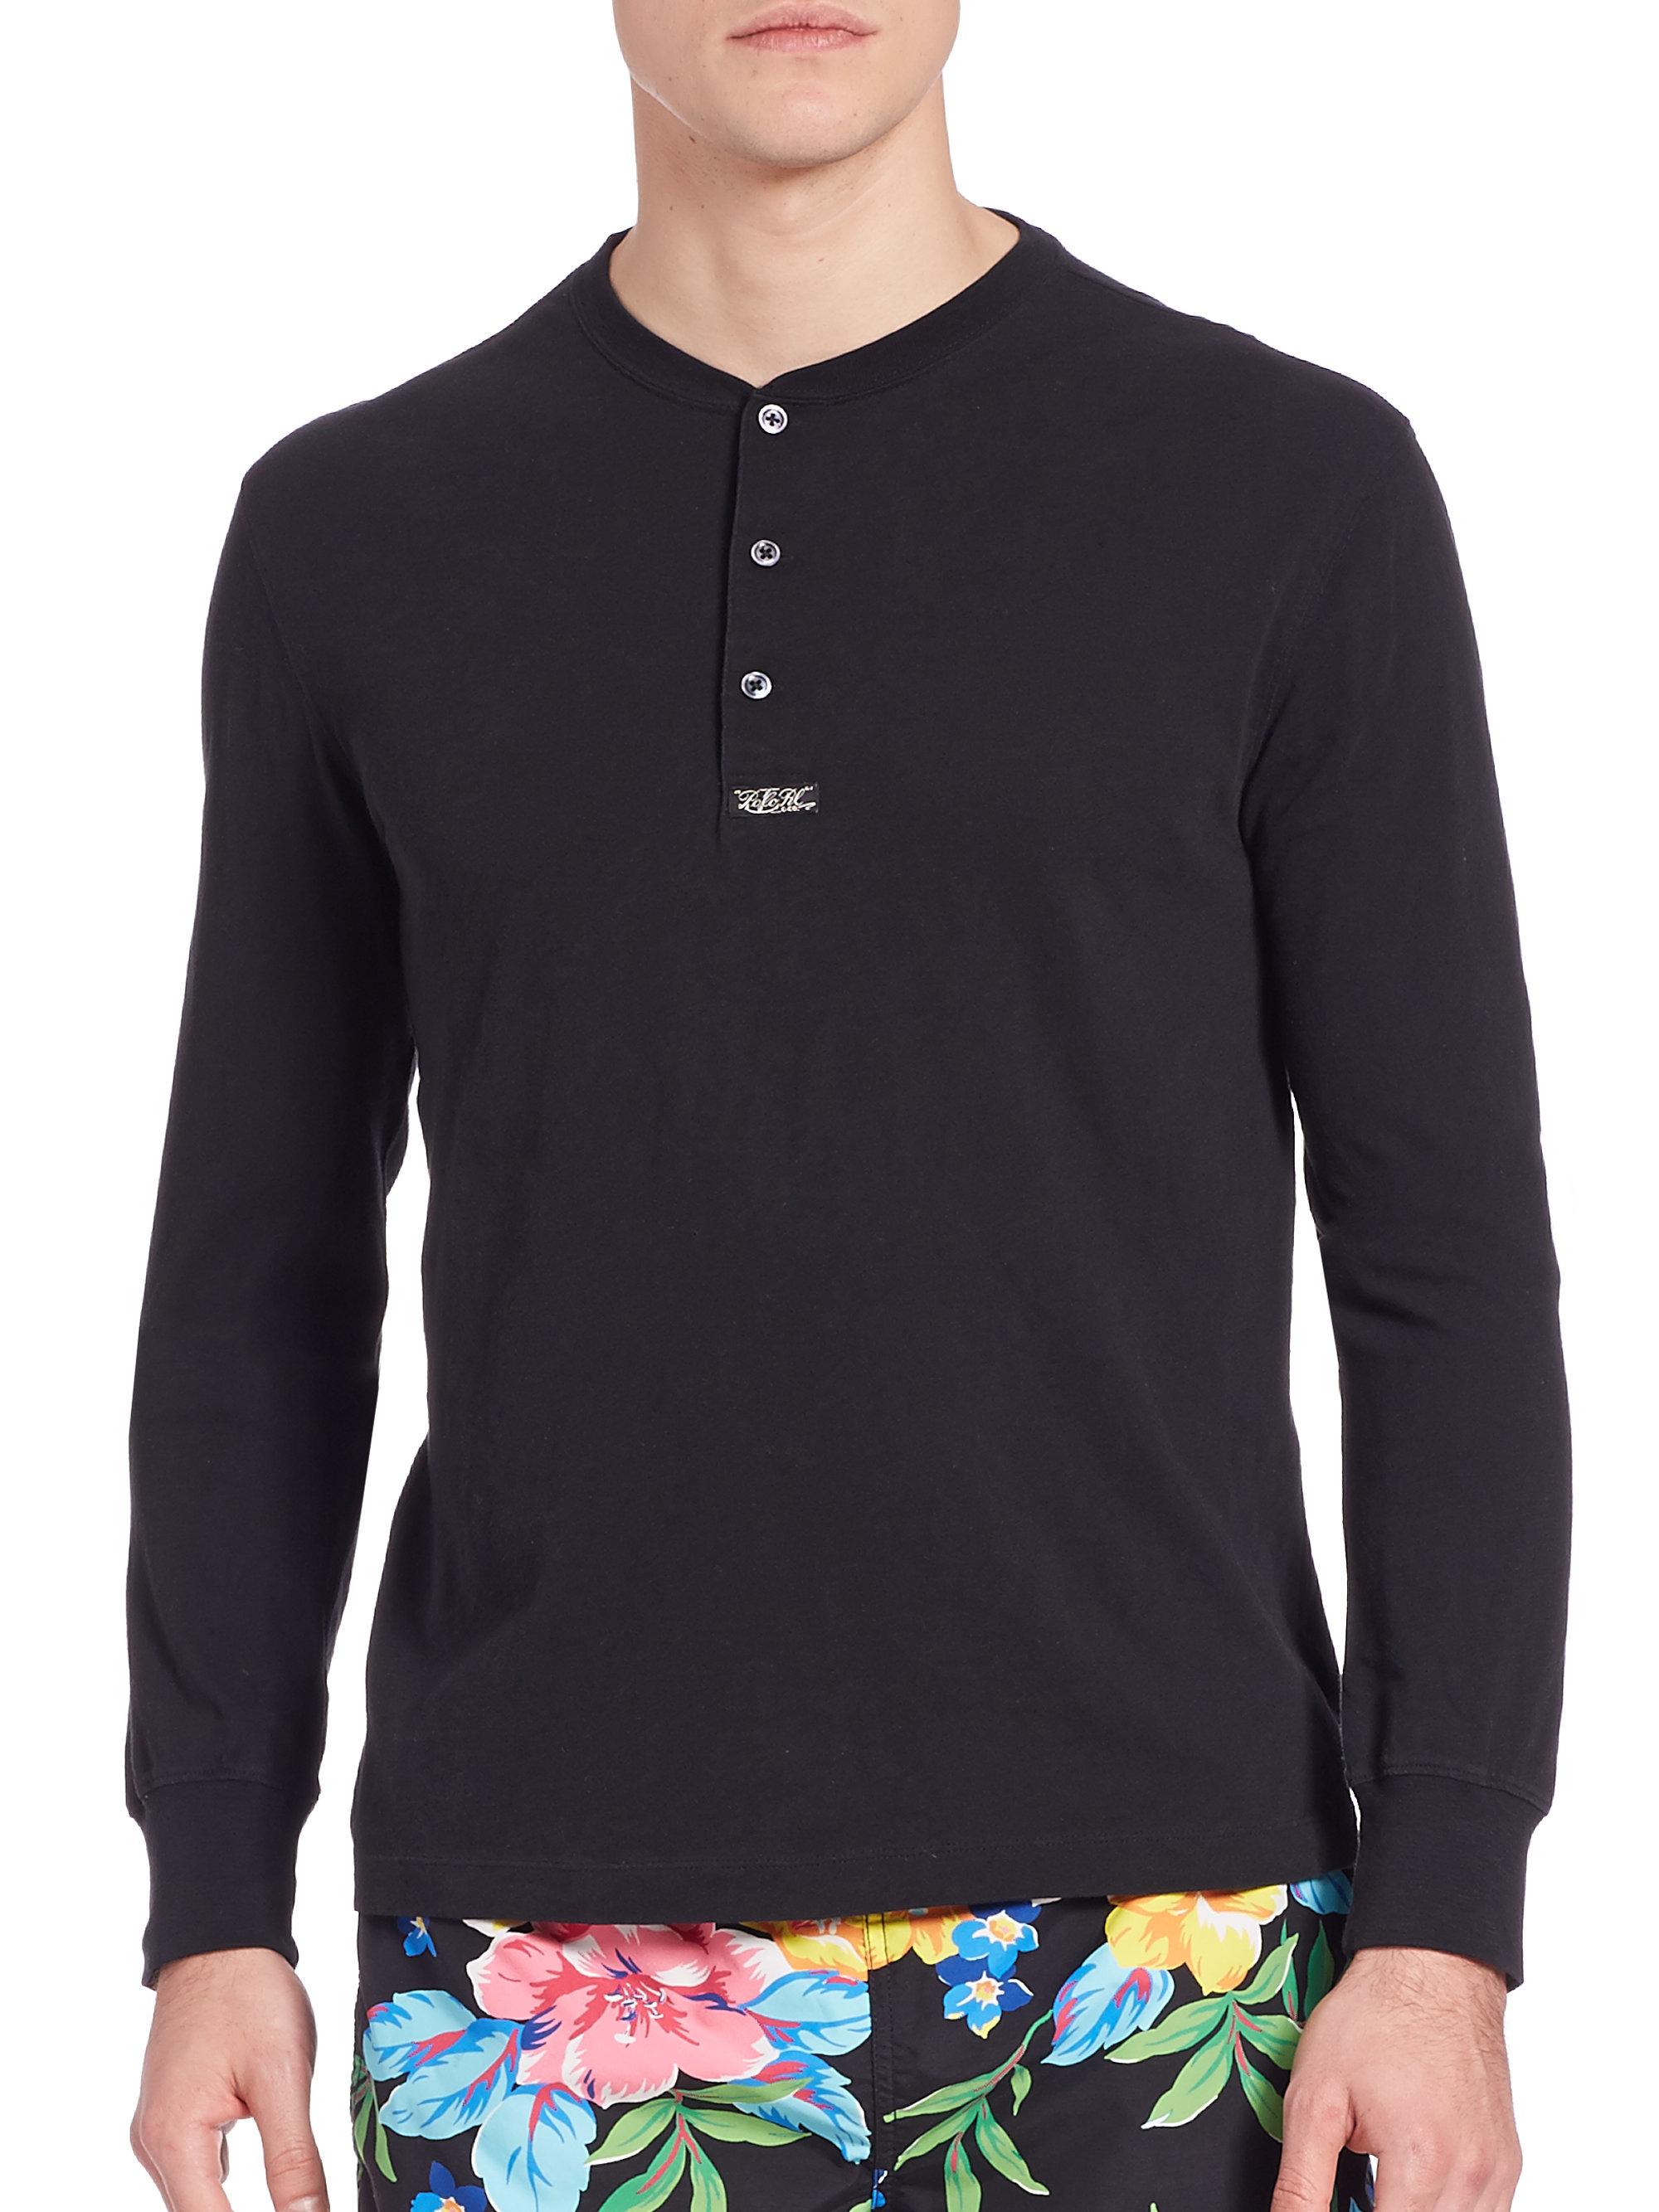 Lyst - Polo Ralph Lauren Long Sleeve Henley in Black for Men d6632d751